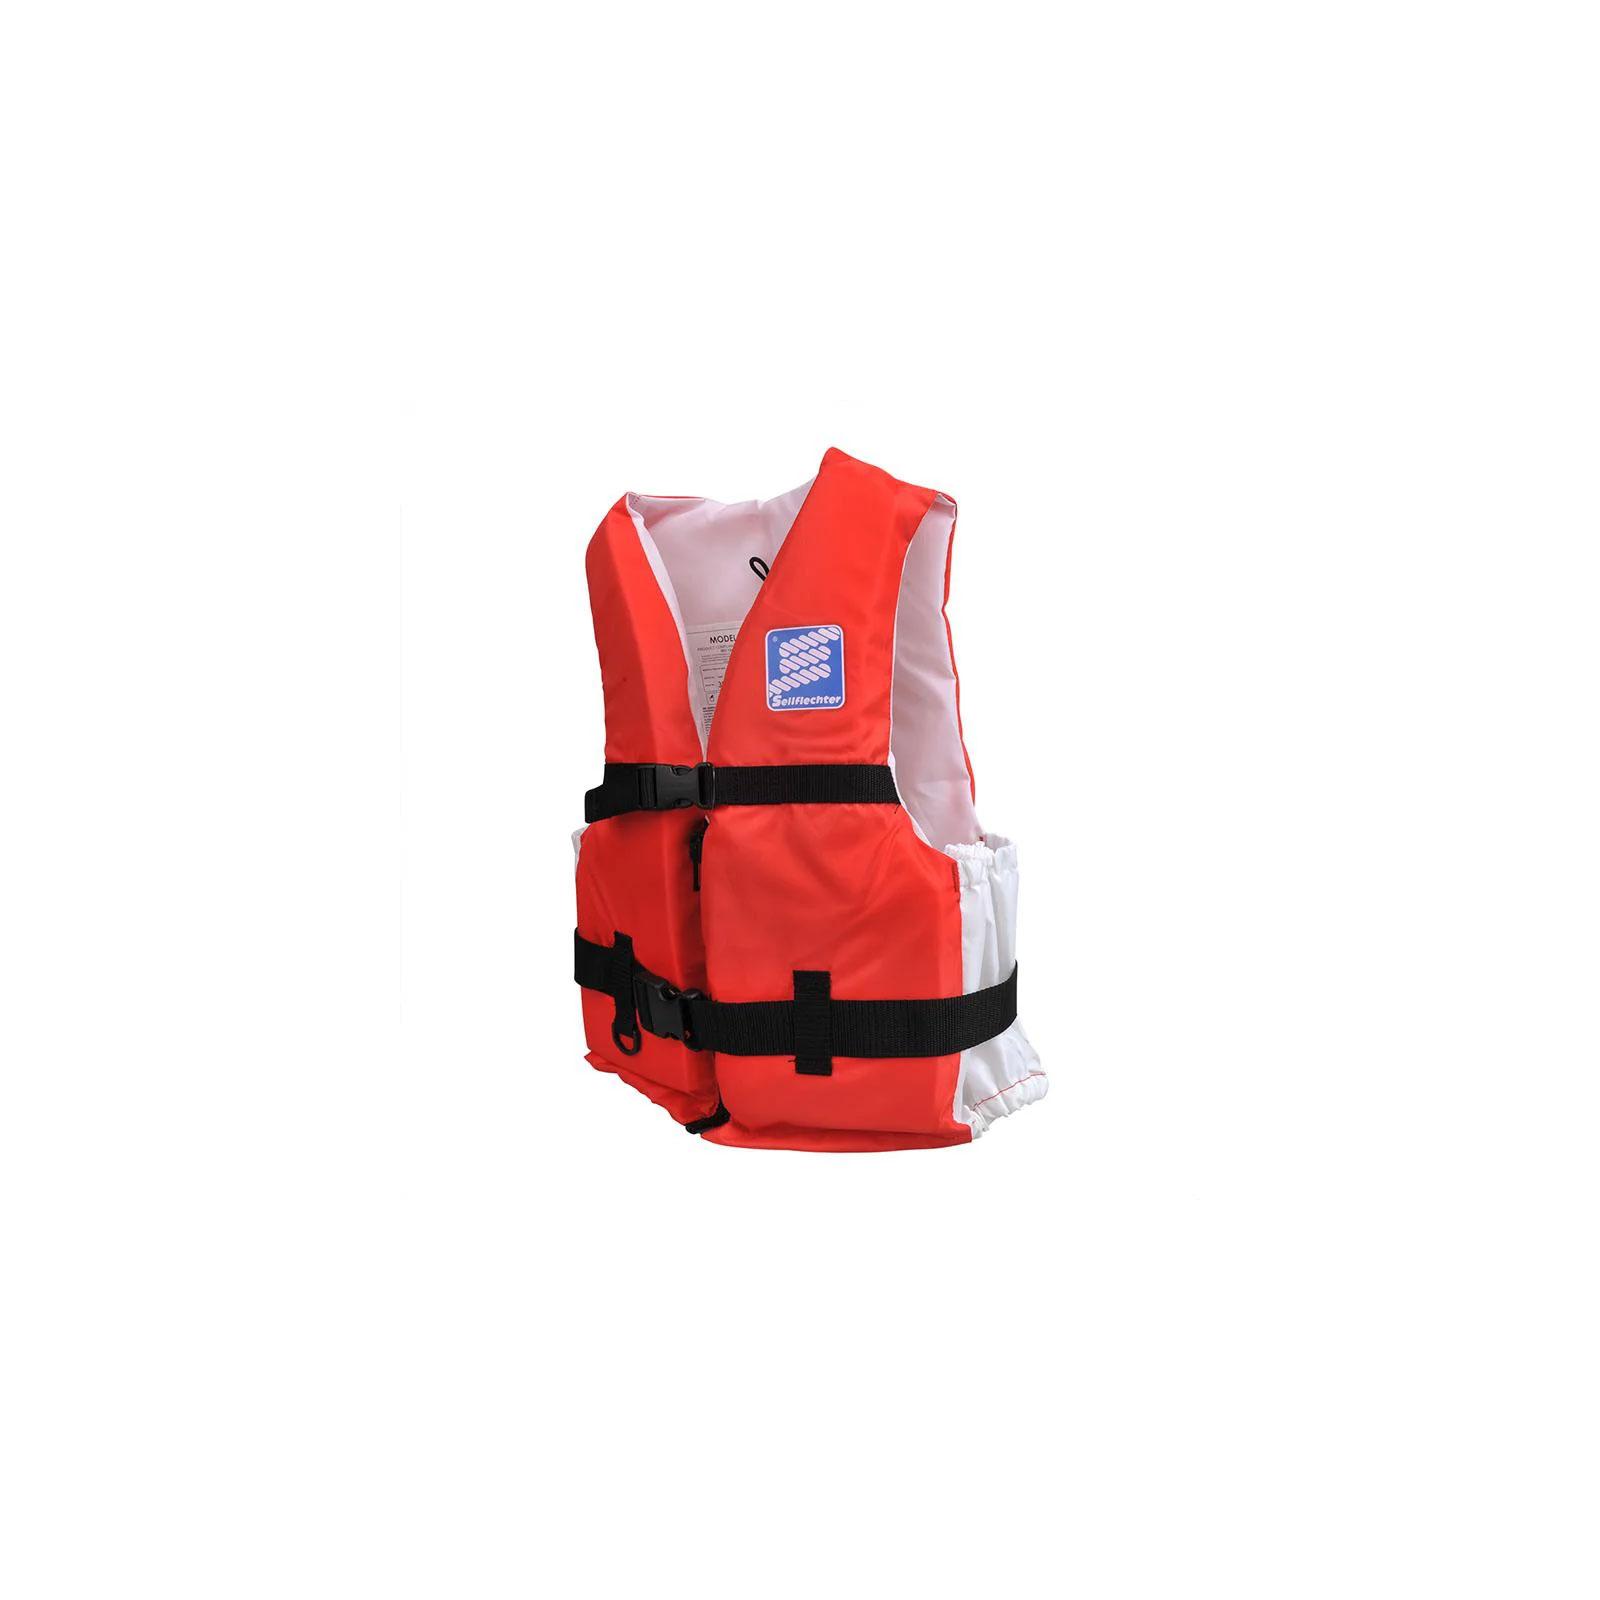 Schwimmweste Rettungsweste  Classic XS/S Junior Child 25-40kg 35N / ISO 12402-5